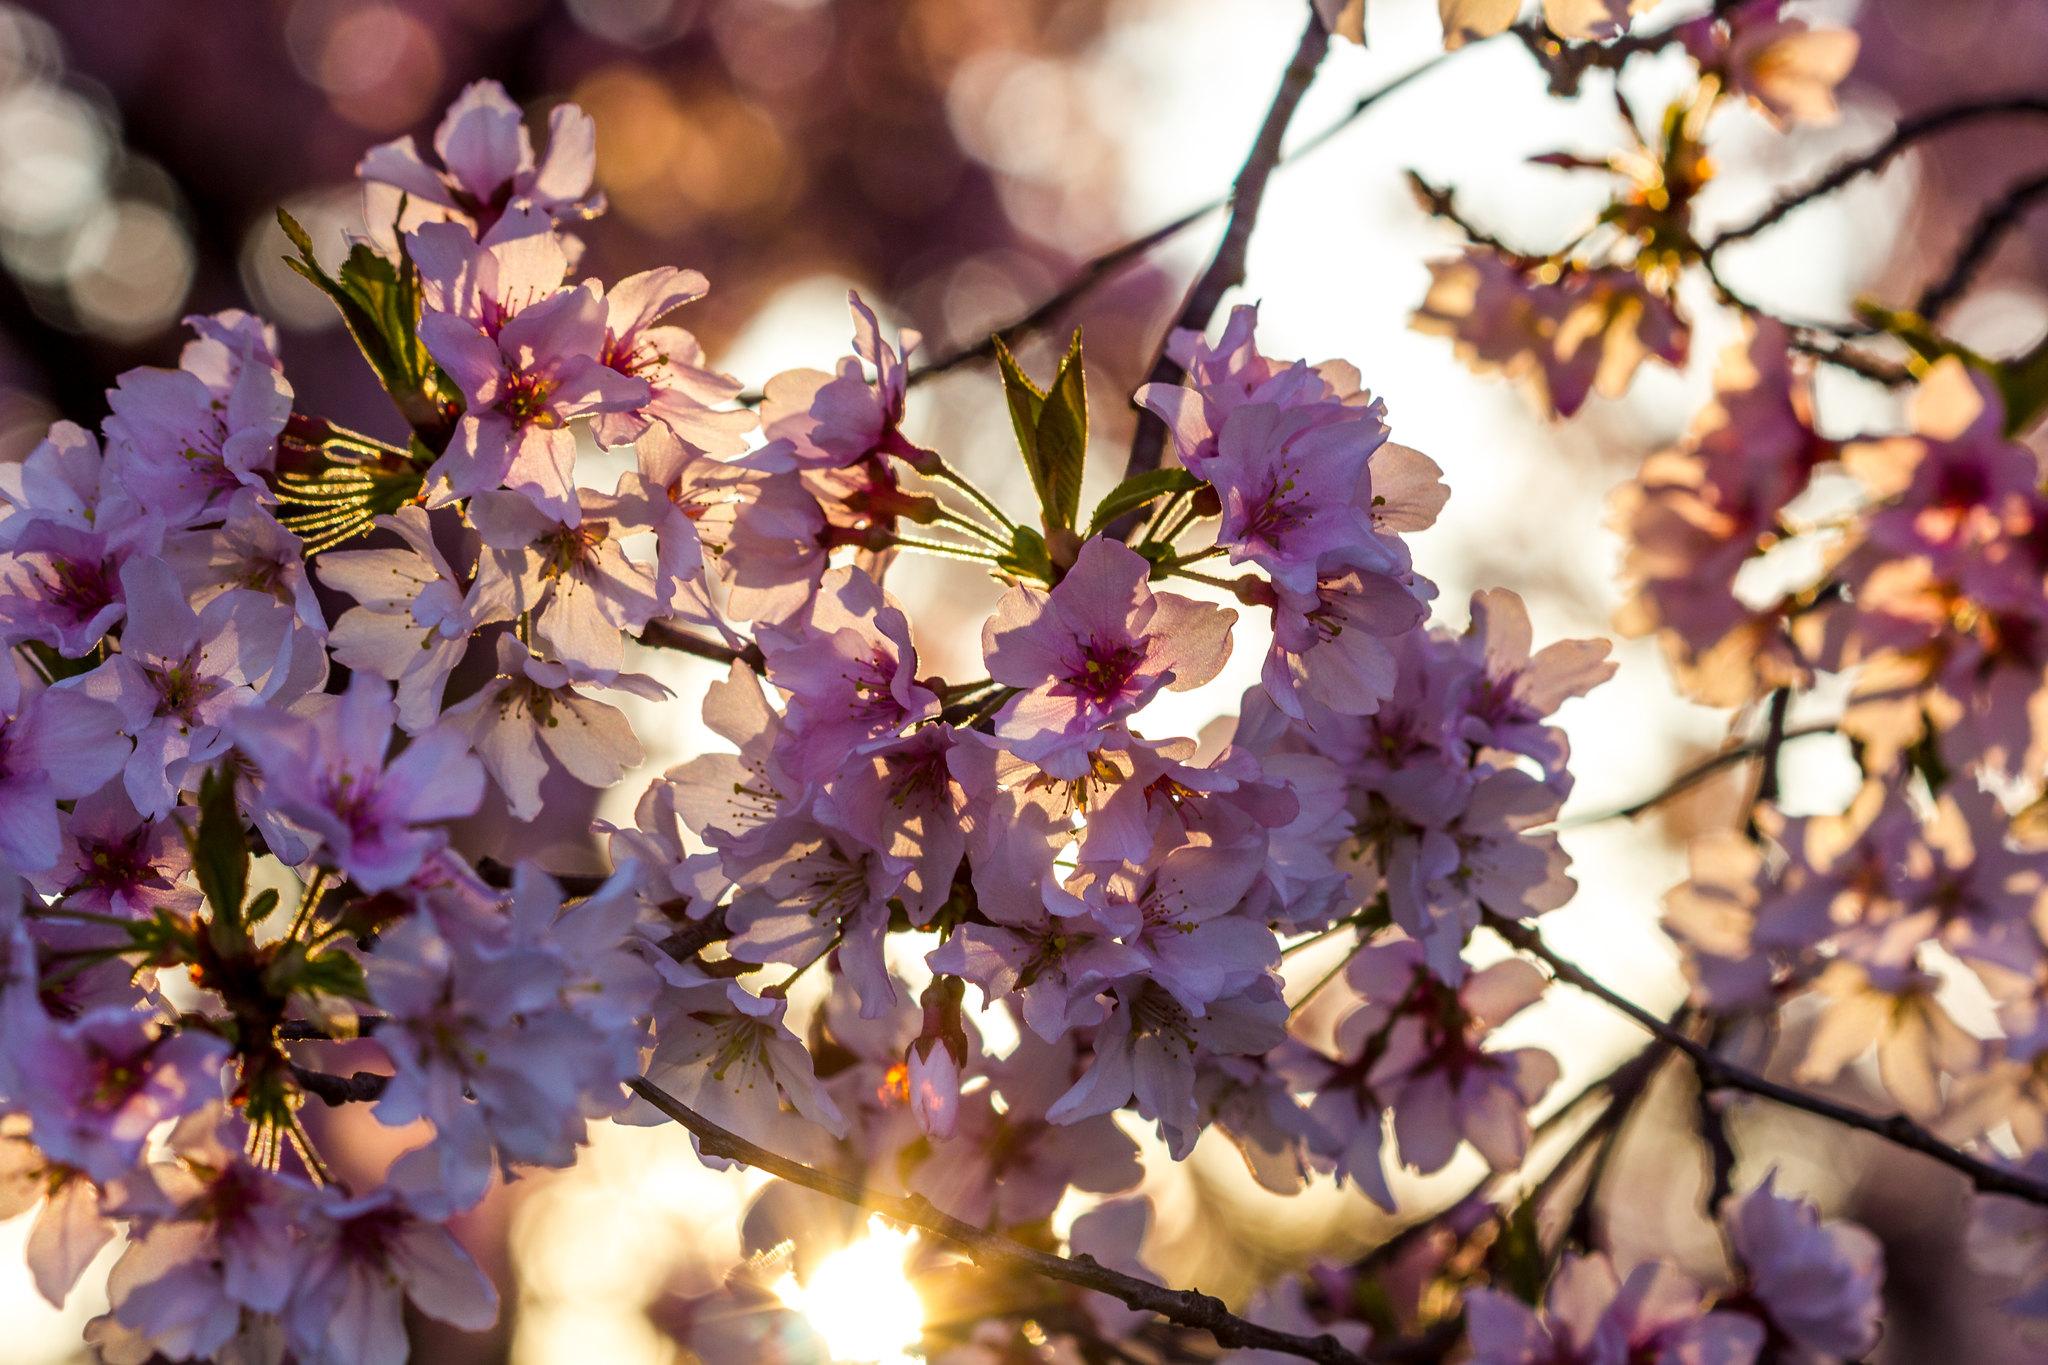 Sunny blossom